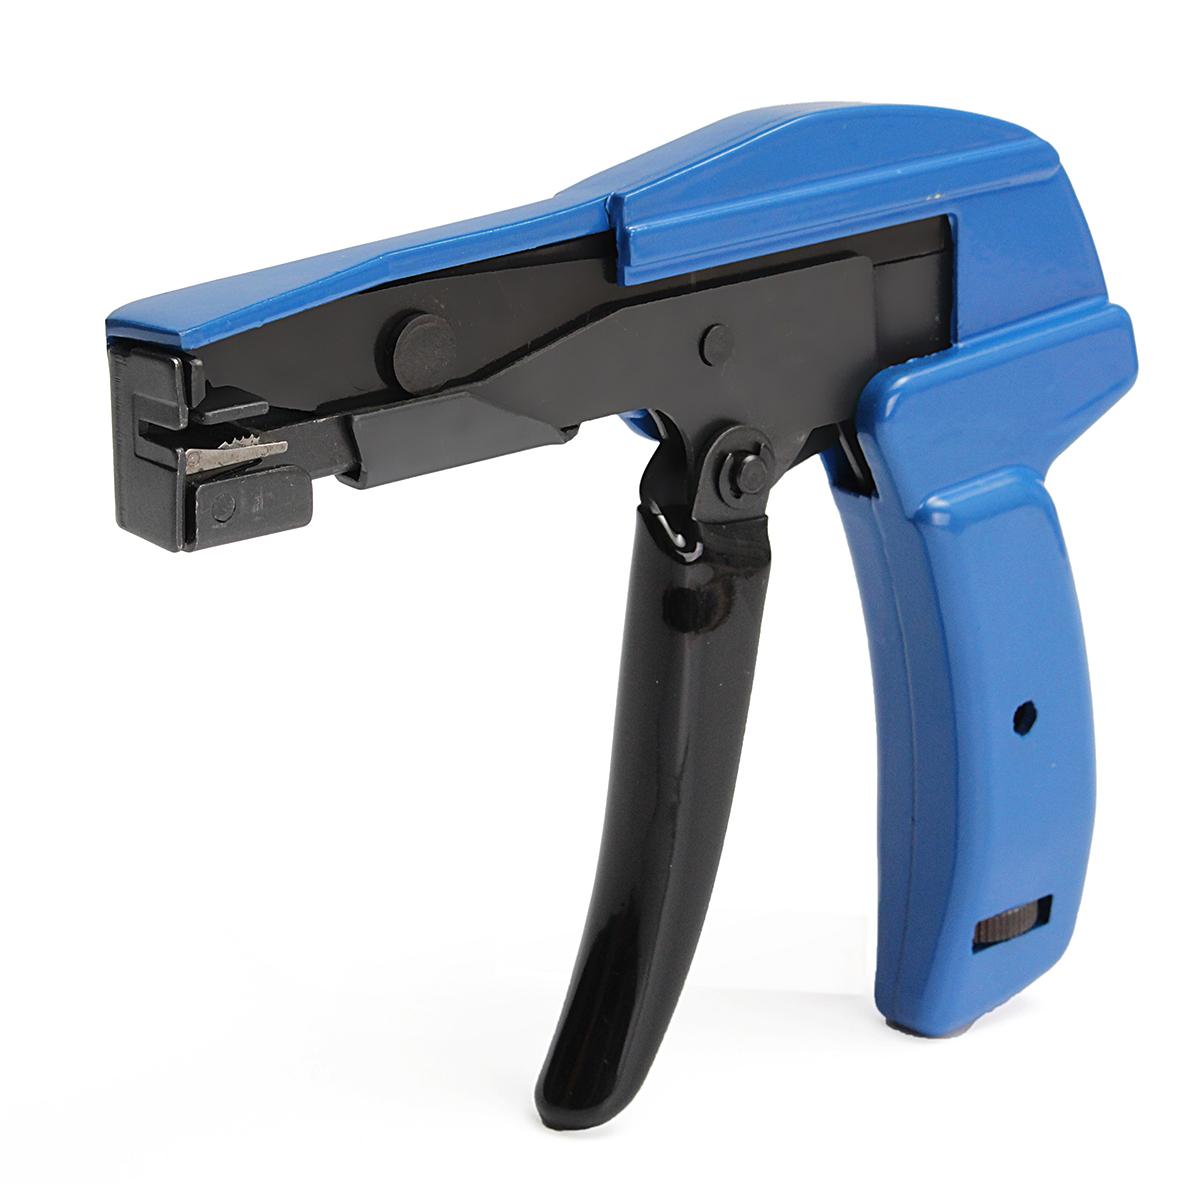 Aluminium Alloy Blue Nylon Cable Tie Tool Installation Tensioning Fastener Tool